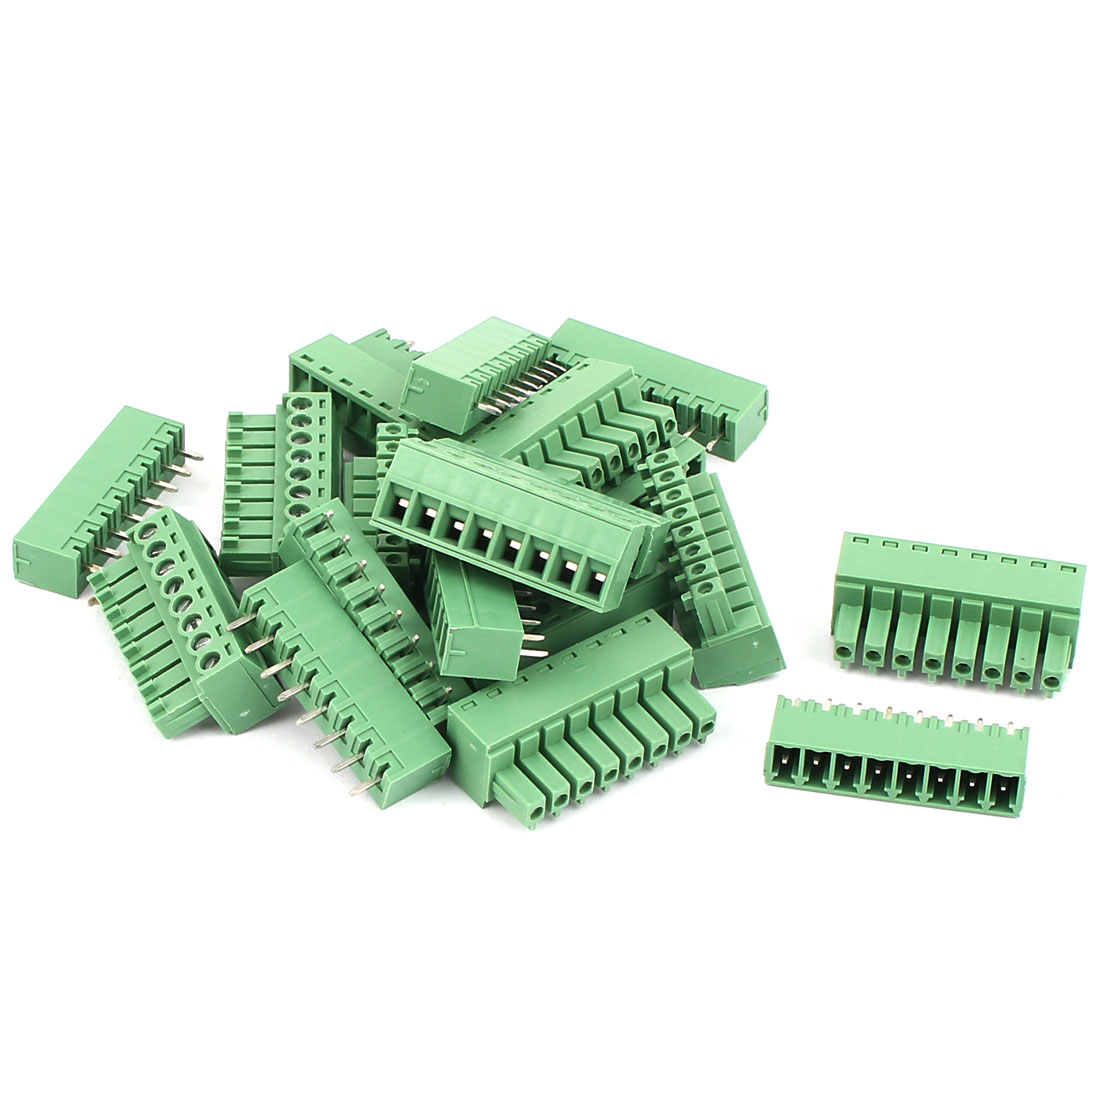 10 Pcs 250V 6A 8-Pin 3mm Spacing PCB Mount Terminal Block Connector